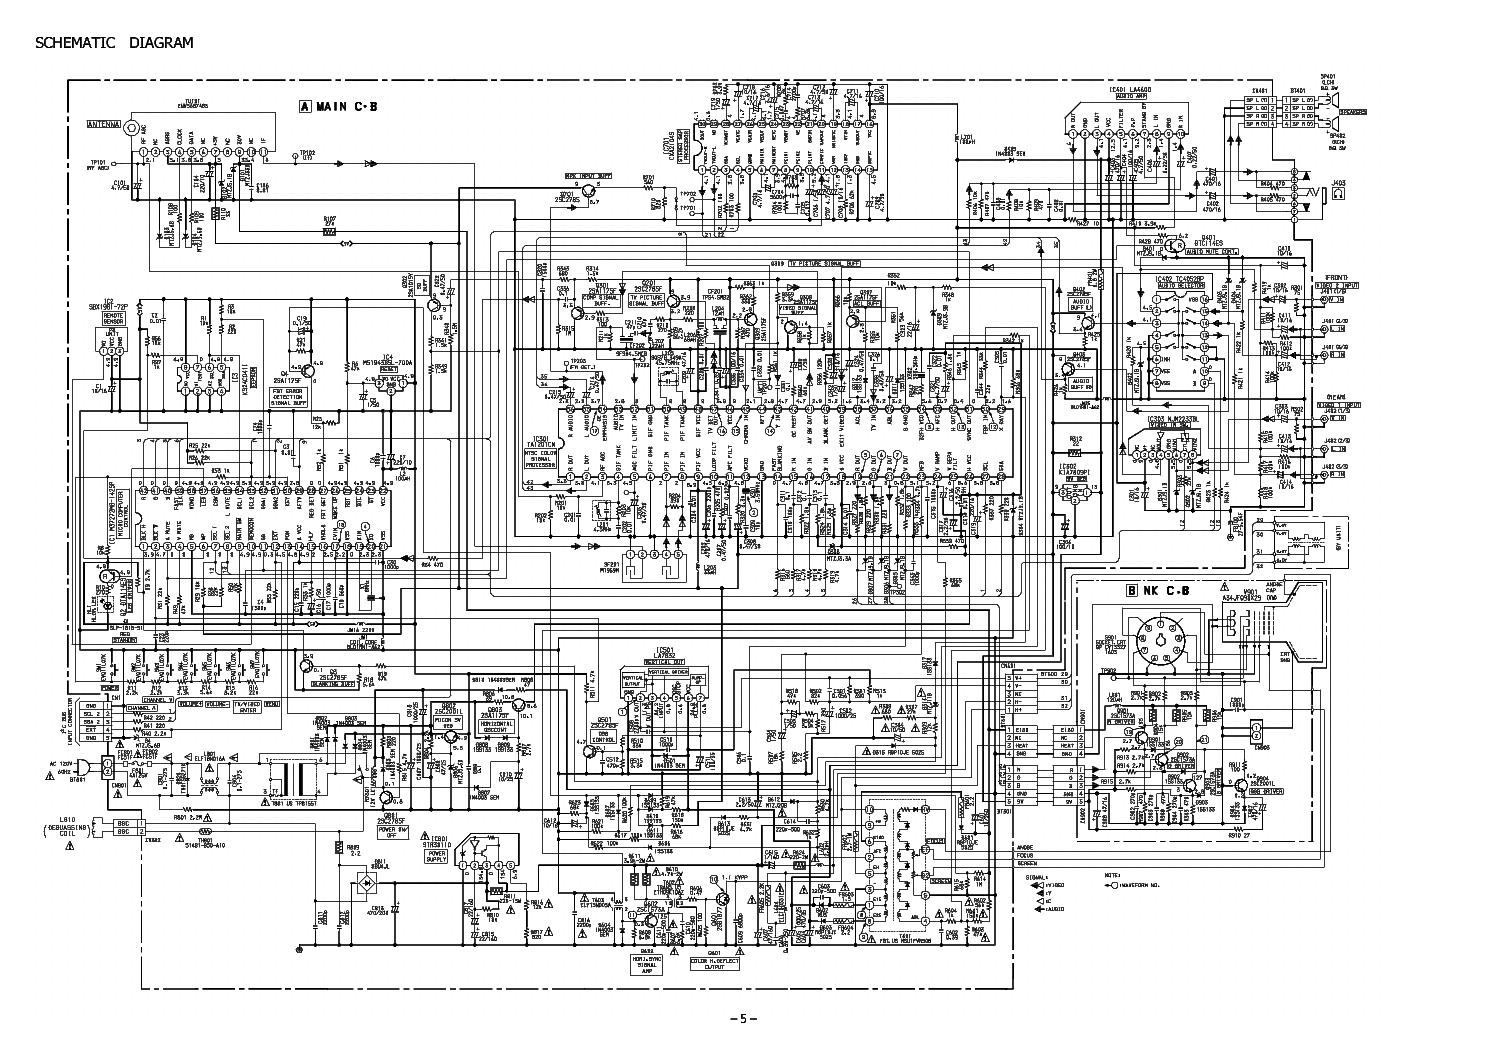 aiwa tv s1311u service manual download schematics eeprom repair rh elektrotanya com aiwa tv-c201ker service manual